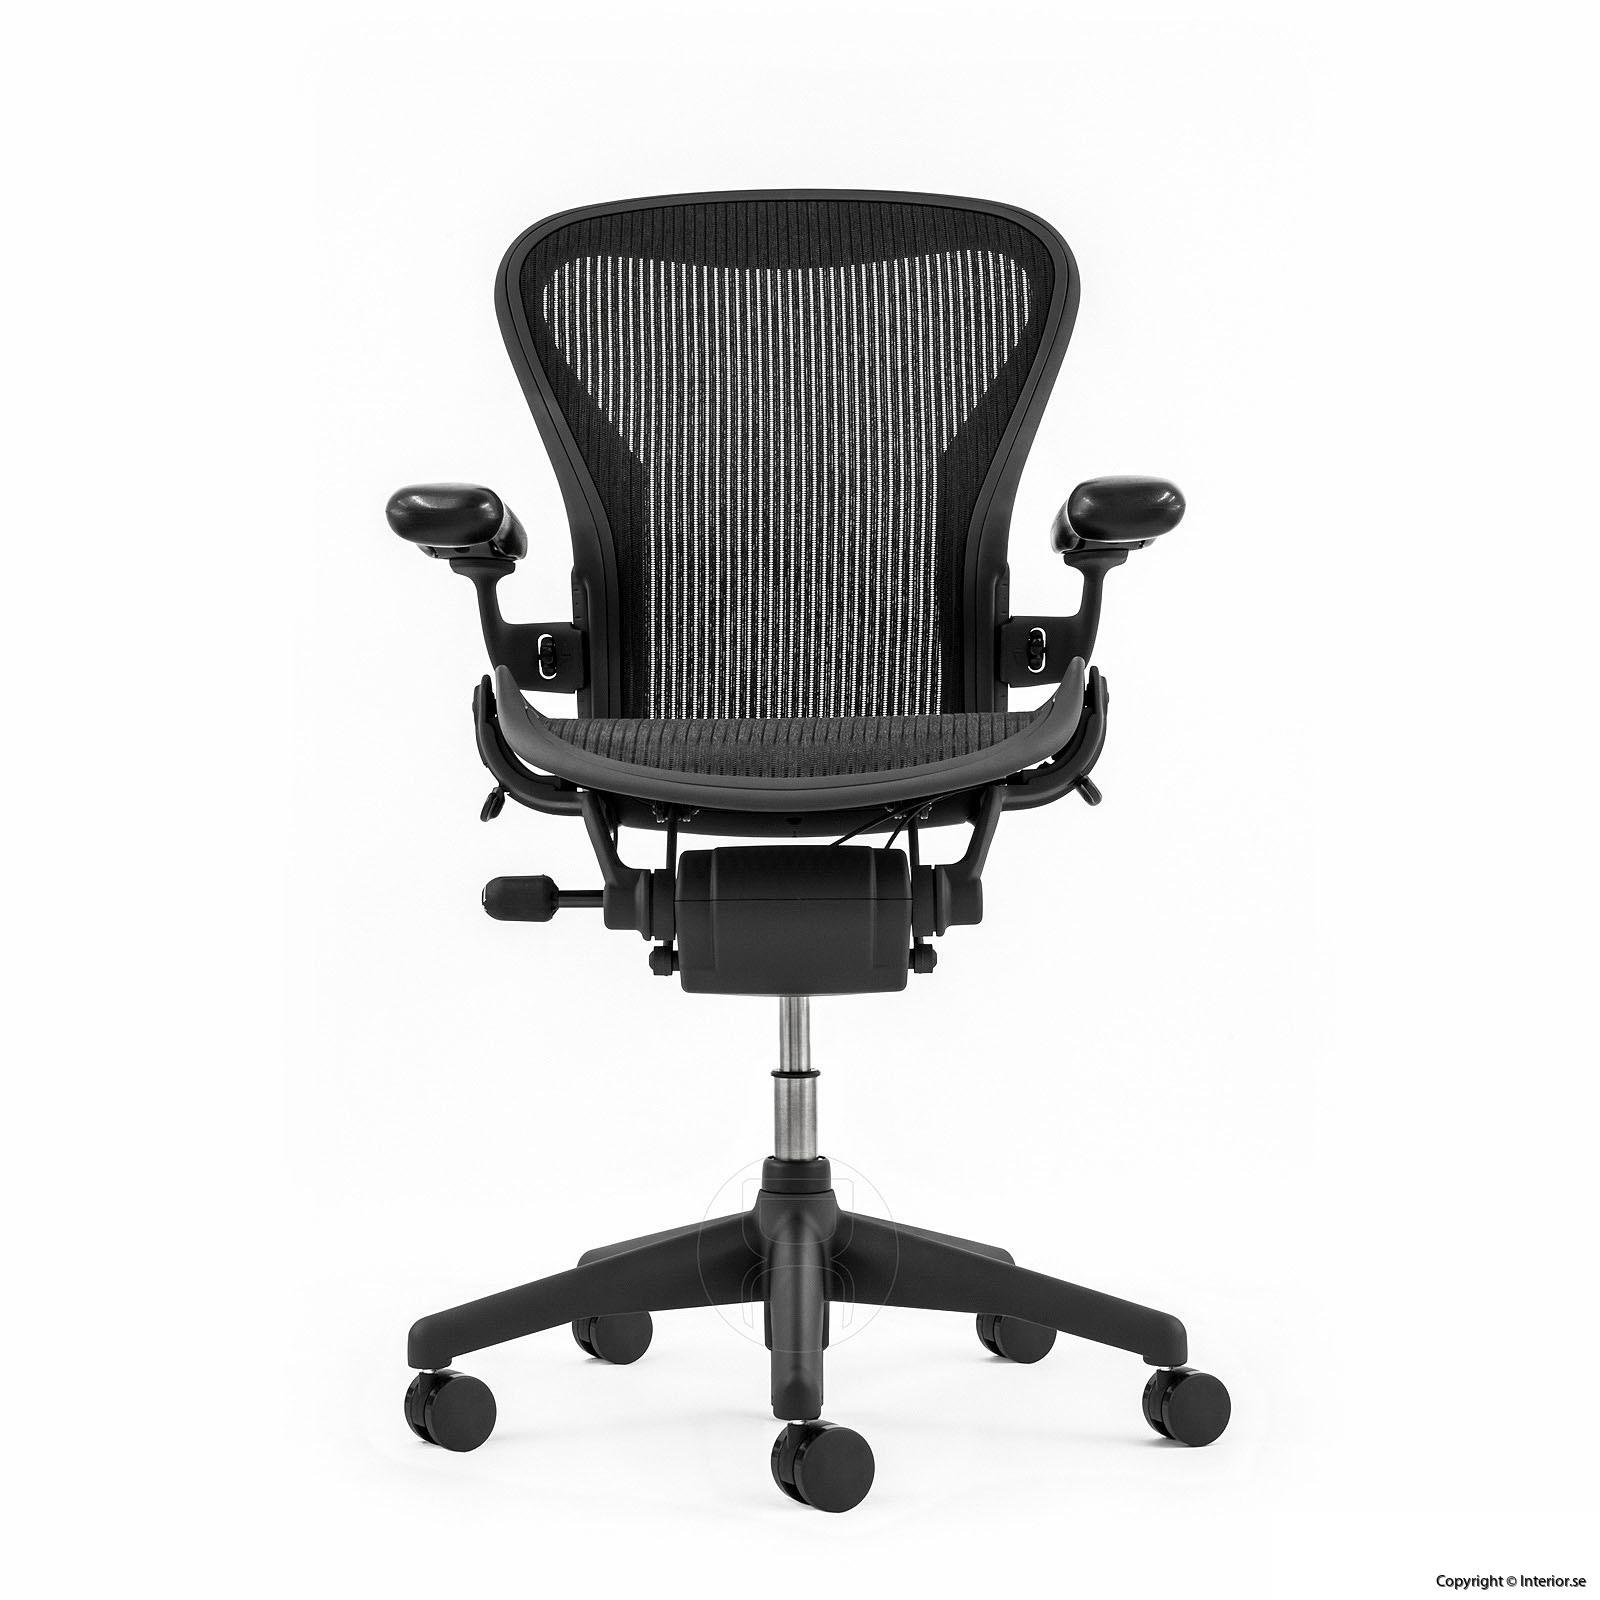 utan billig lumbar pad svankstöd herman miller aeron a small b medium c large refurbished sverige europe kontorsstol begagnad